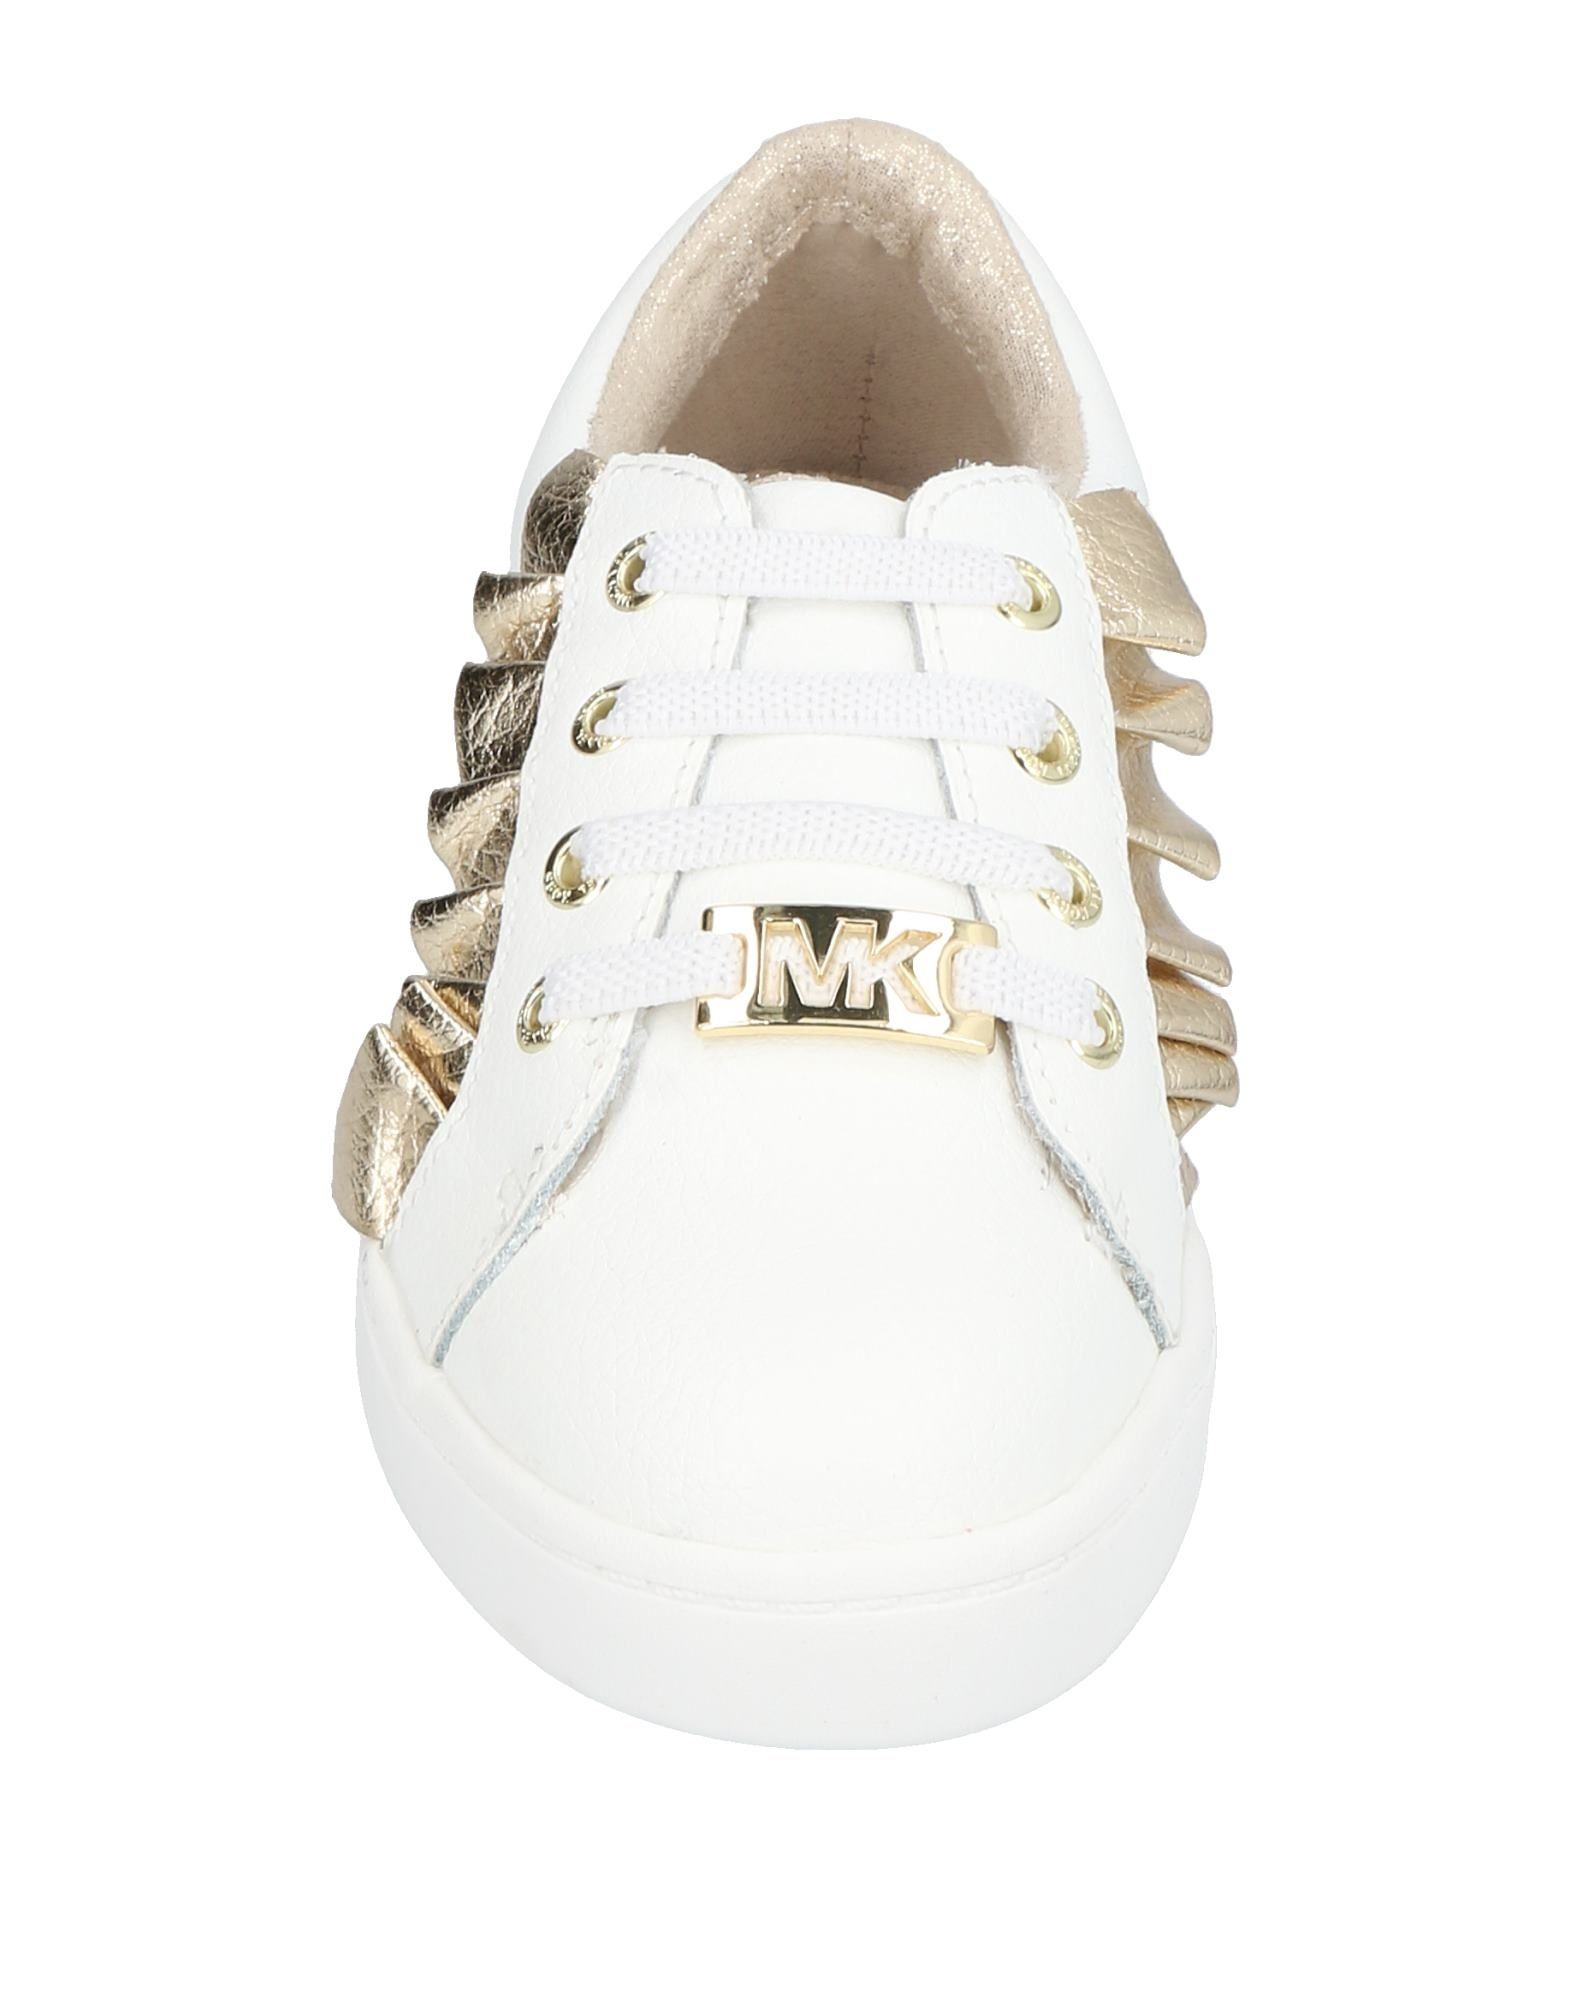 b04d4211e3 MICHAEL MICHAEL KORS ΠΑΠΟΥΤΣΙΑ Παπούτσια τένις χαμηλά